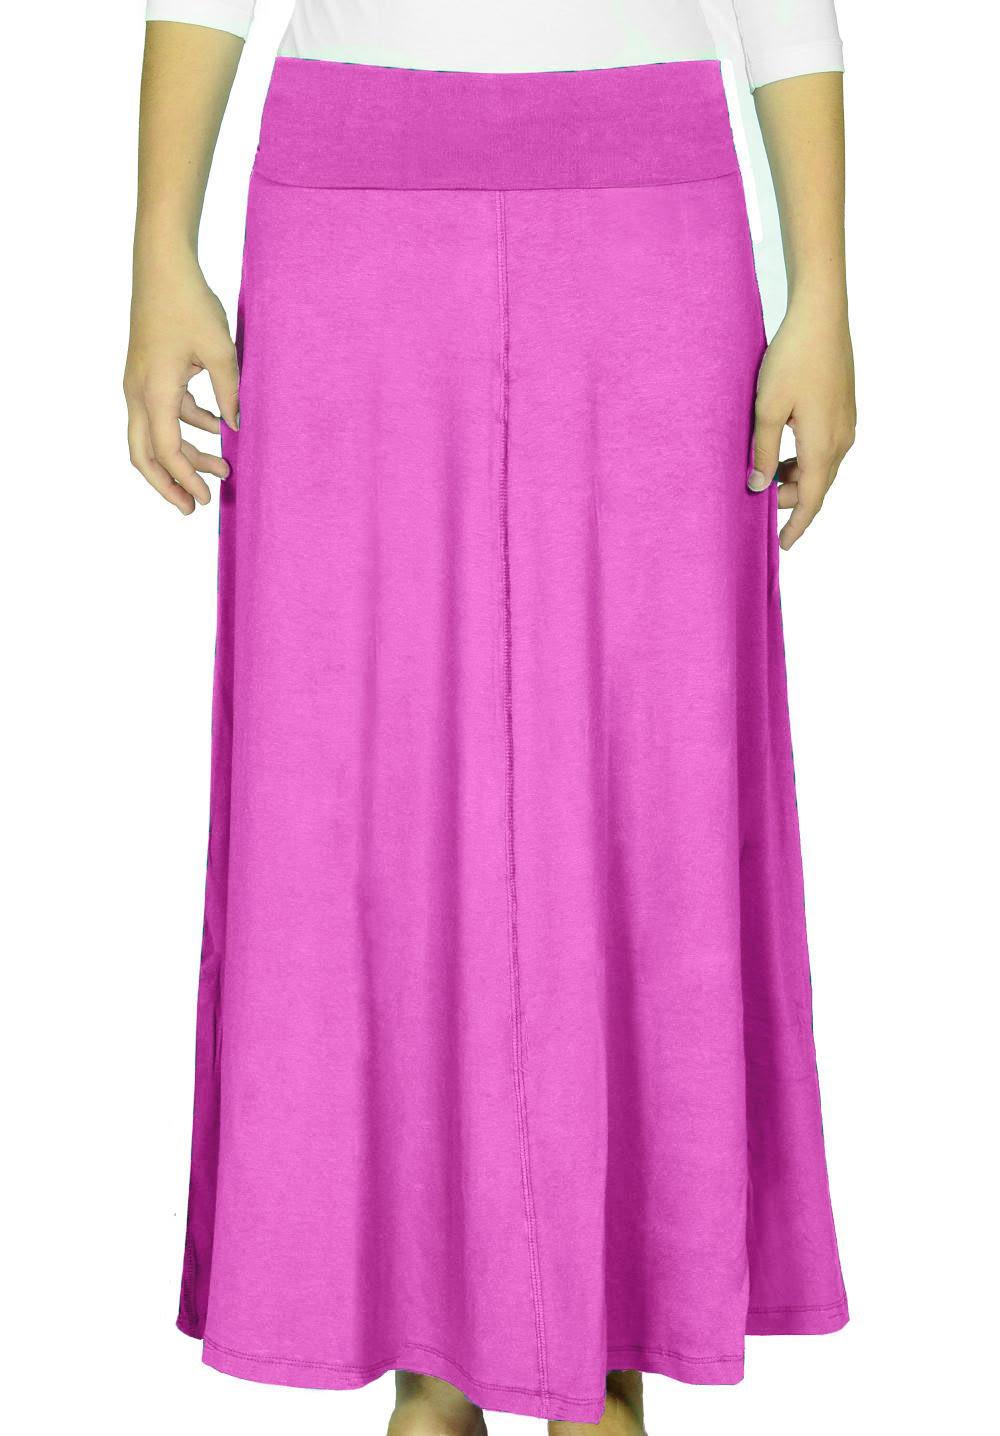 Modest Skirts For Women Long And Knee Length Skirts